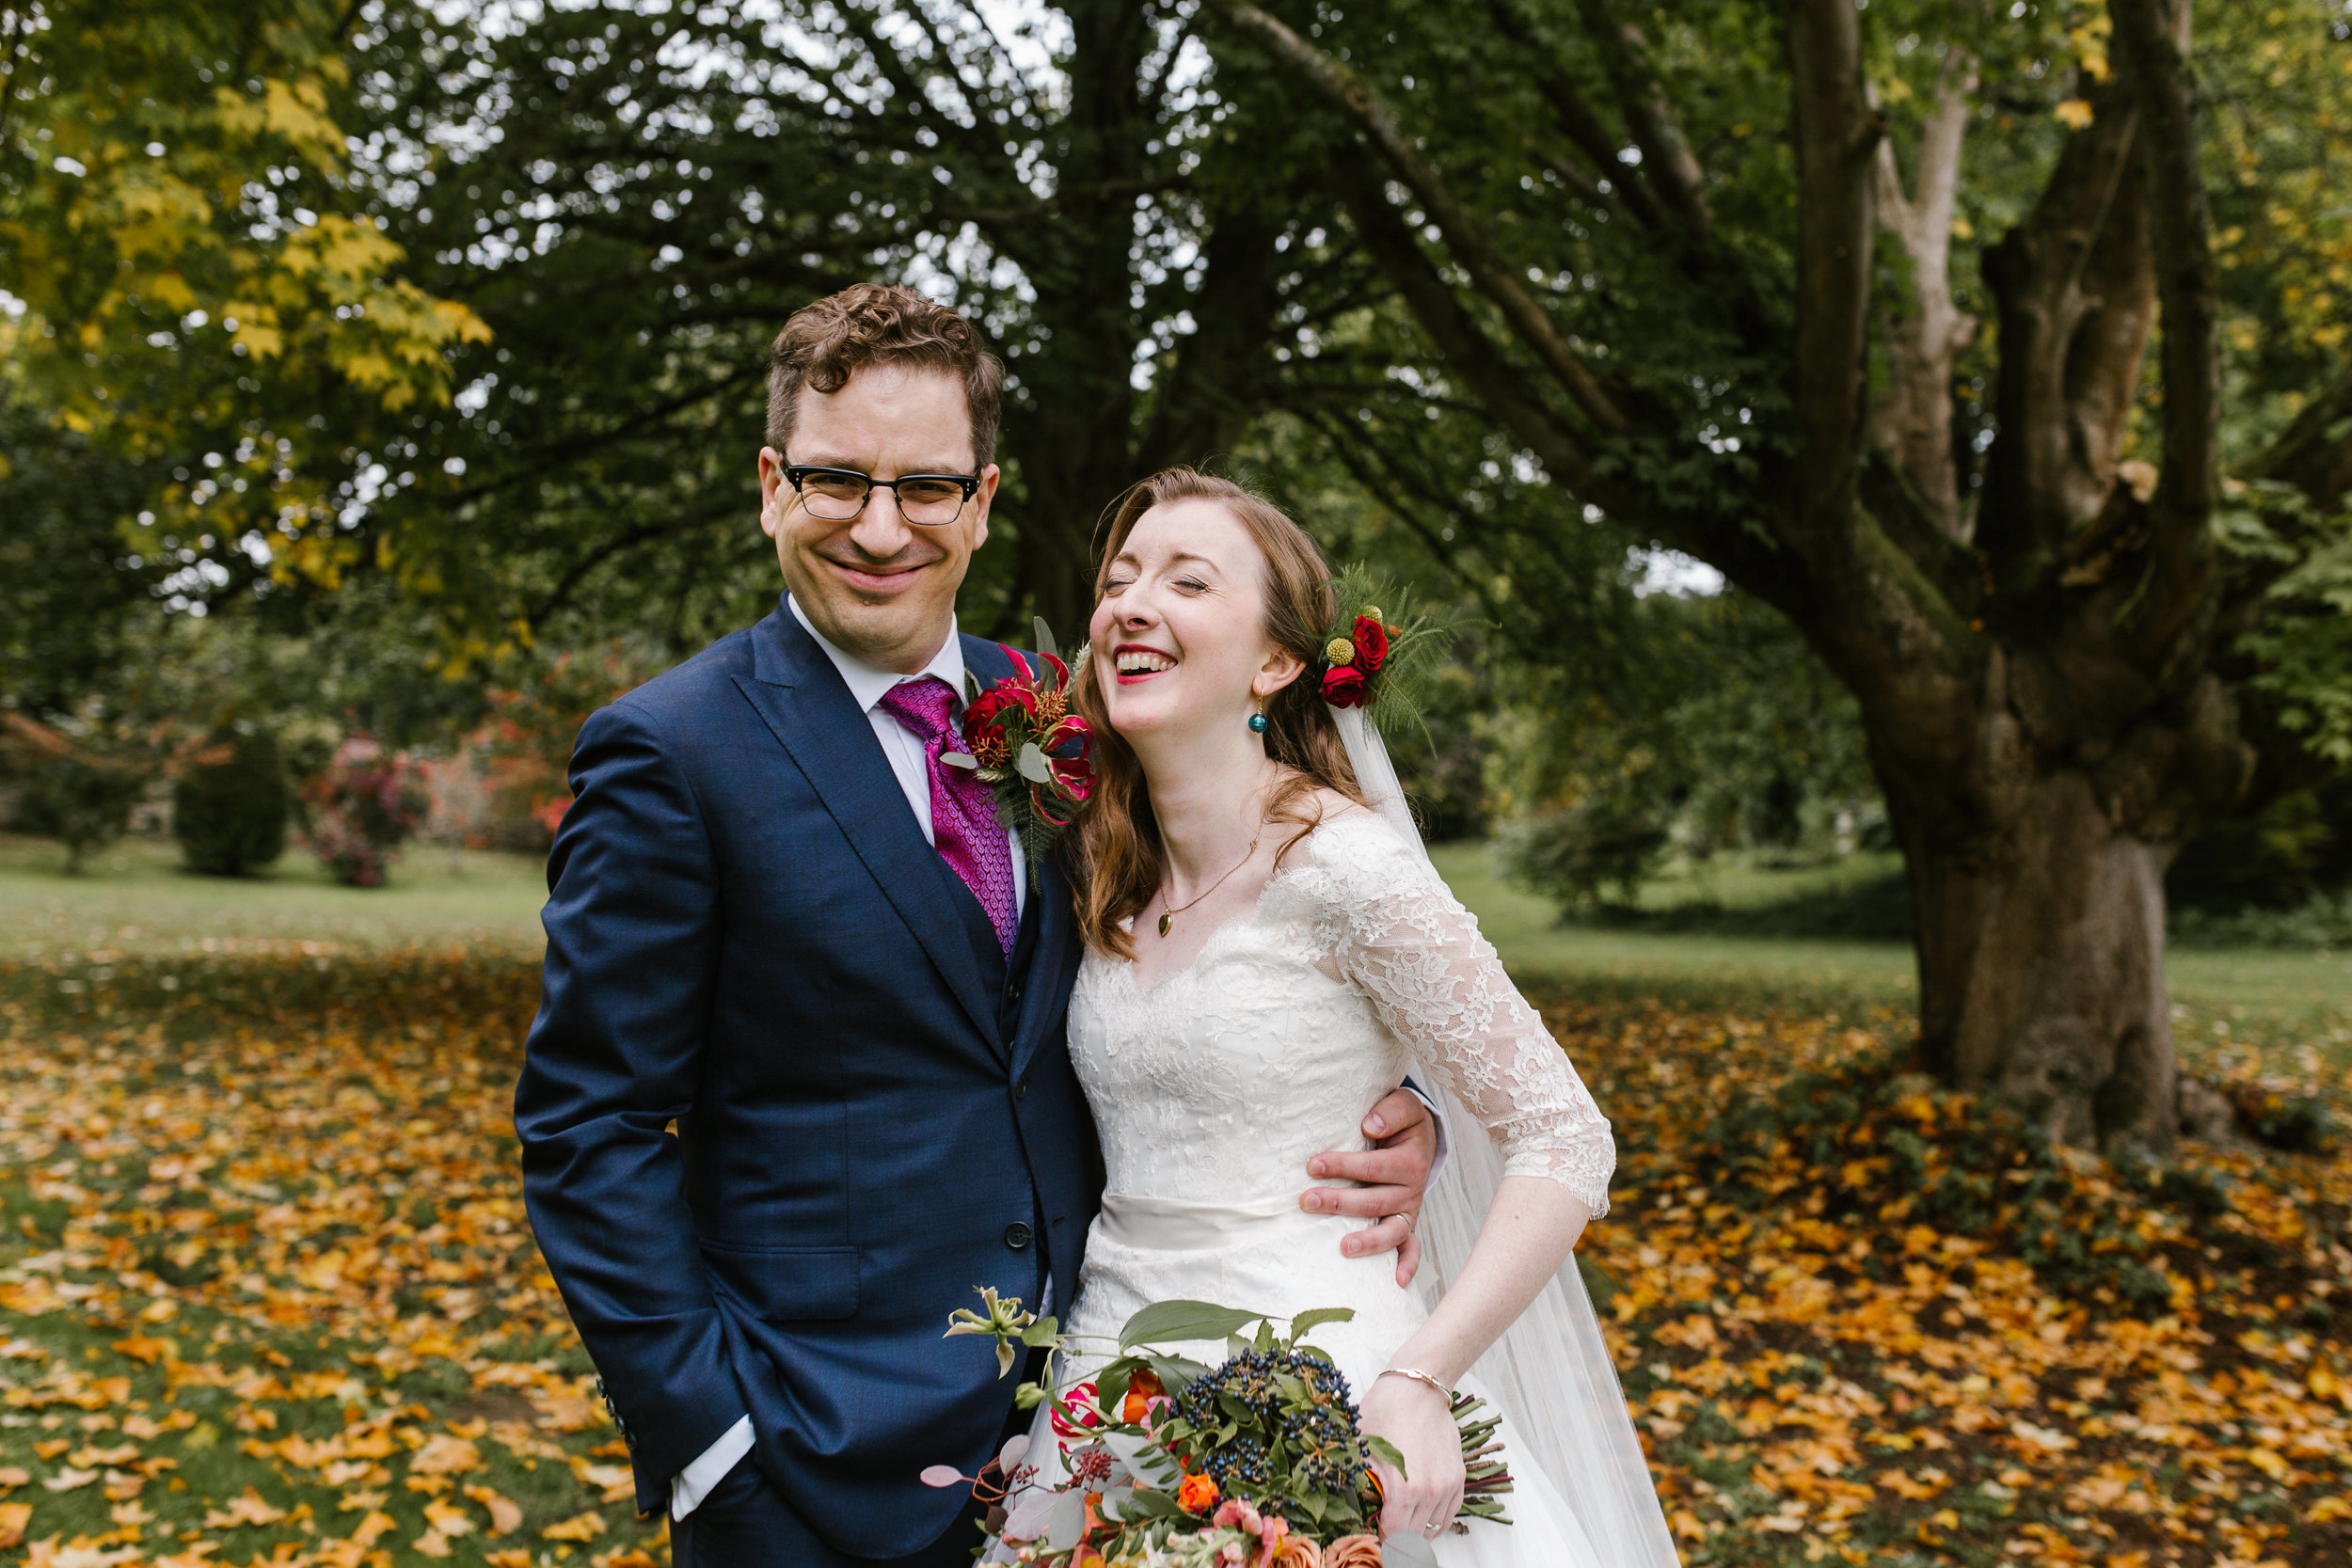 Cowley Manor, Cowley Manor weddinf, Cowley Manor wedding photographer, Cotswolds wedding, Cotswolds wedding photographer, staffordshire wedding photographer, autumn wedding, autumn wedding ideas-224.jpg